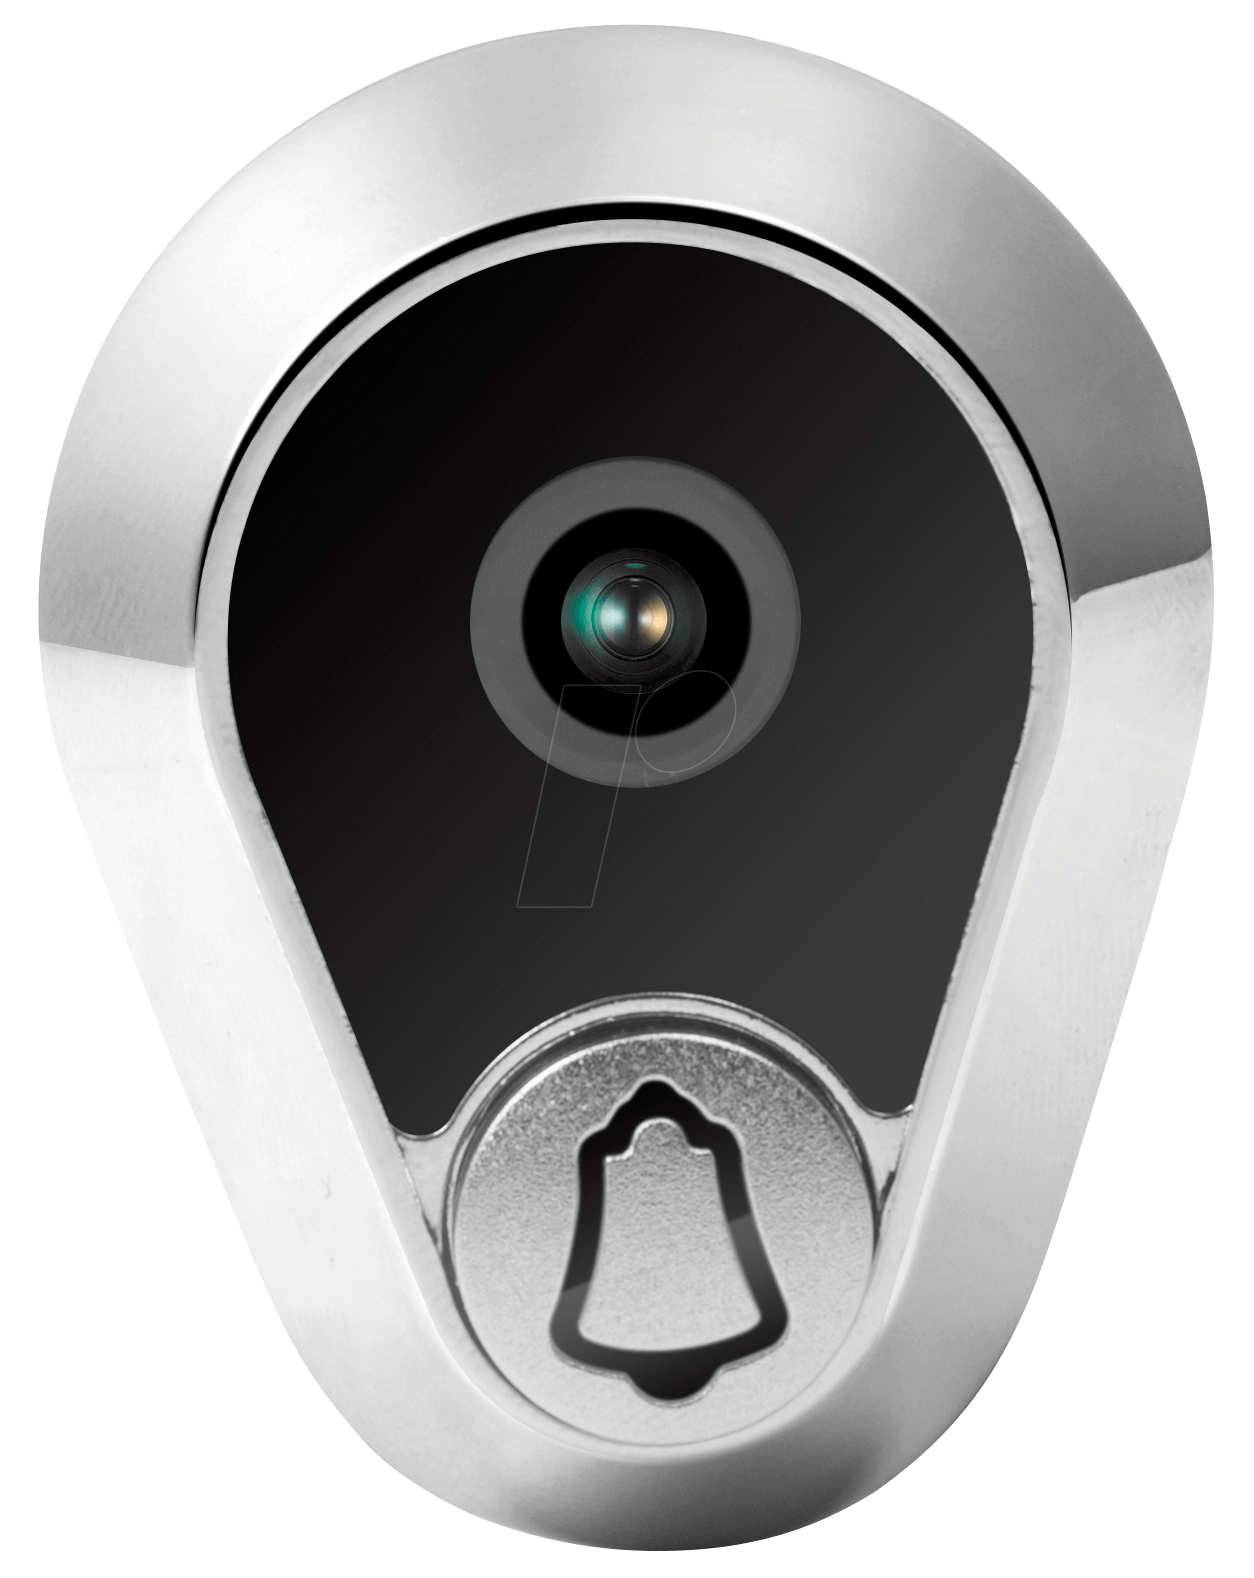 technaxx tx 75 t rspion mit kamera bei reichelt elektronik. Black Bedroom Furniture Sets. Home Design Ideas